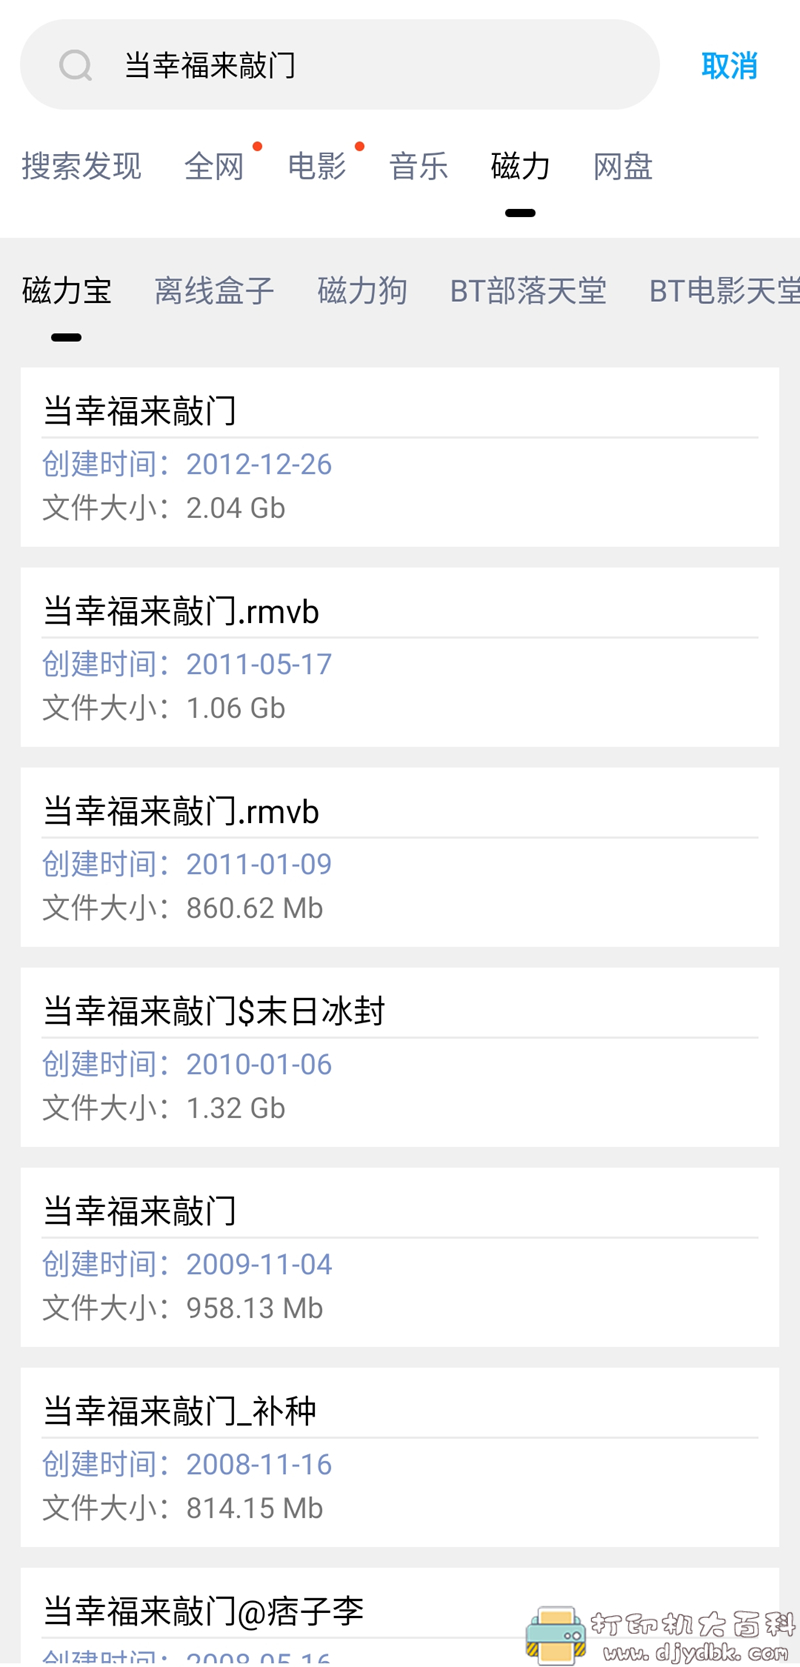 [Android]全能下载神器 – 快下载,支持多平台视频无水印解析下载图片 No.6